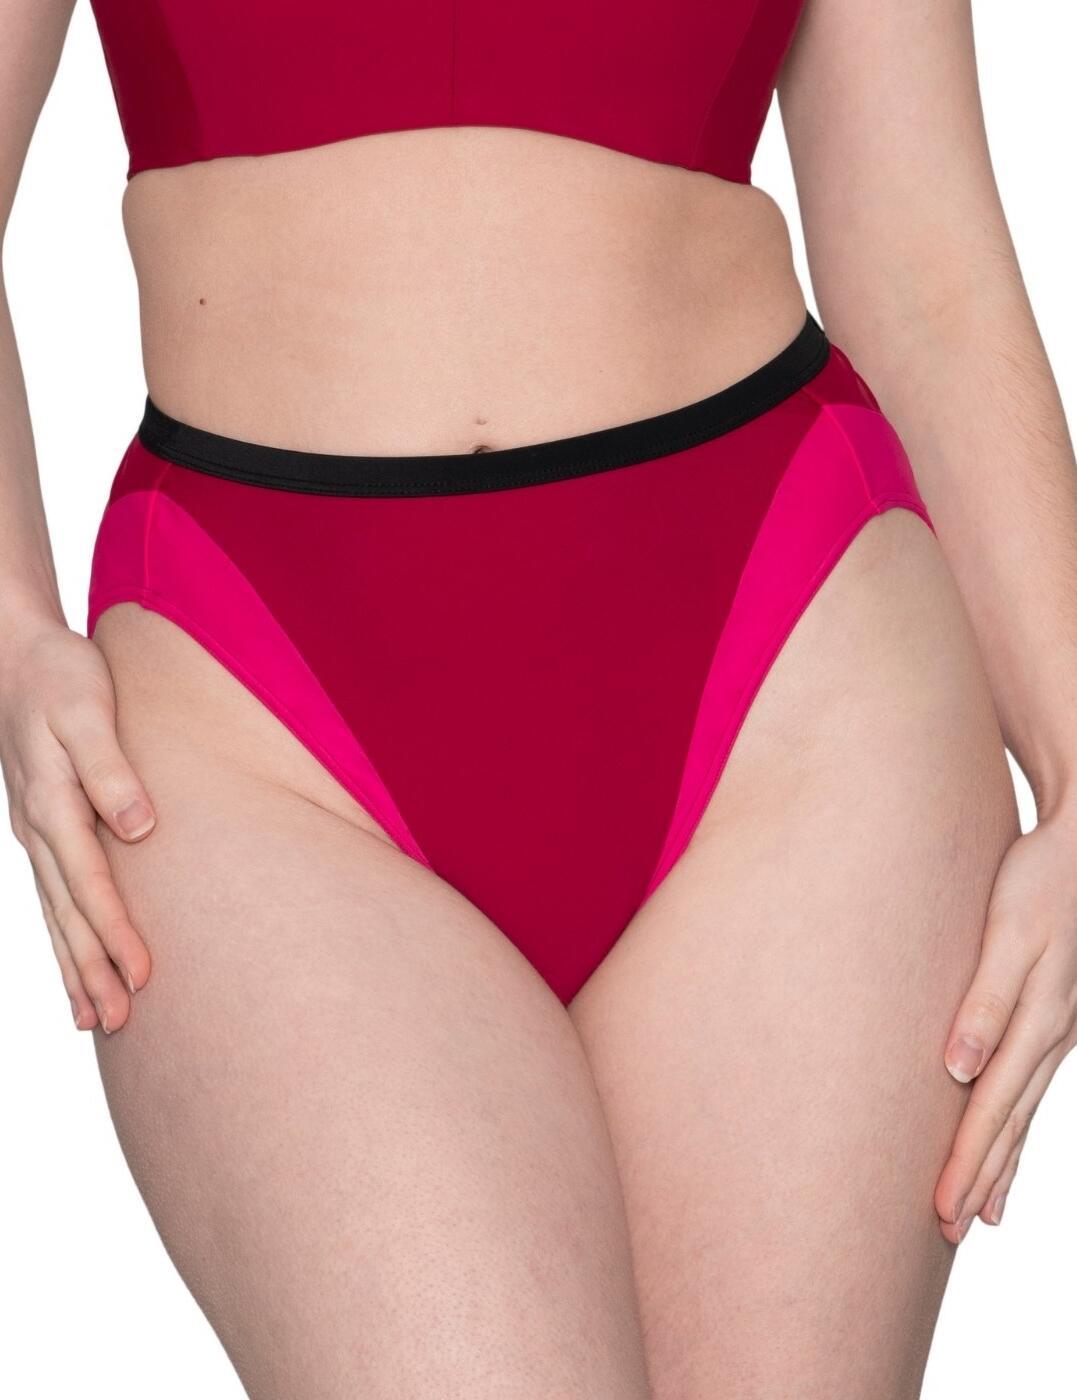 Curvy Kate Subtropic High Waist Brief in Cherry Red/Pink